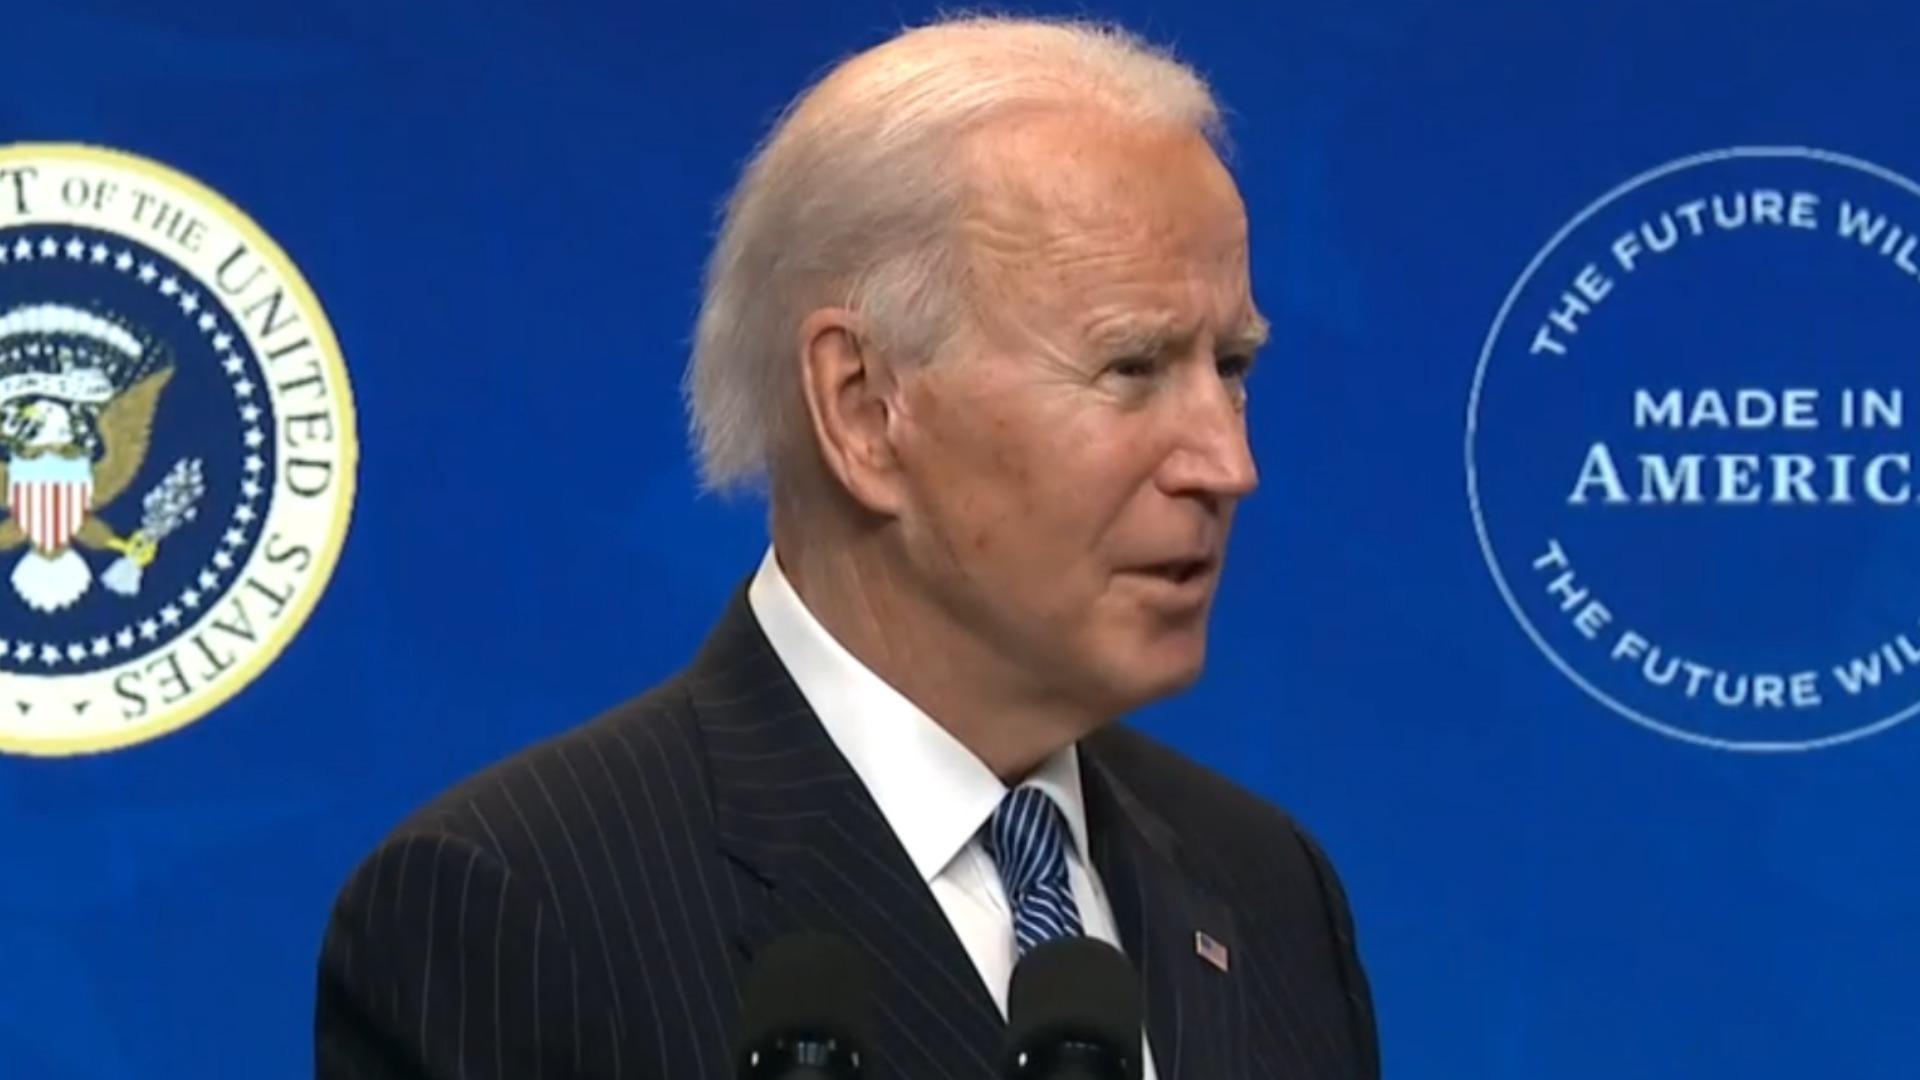 news.yahoo.com: Biden to address racism toward Asian Americans during pandemic